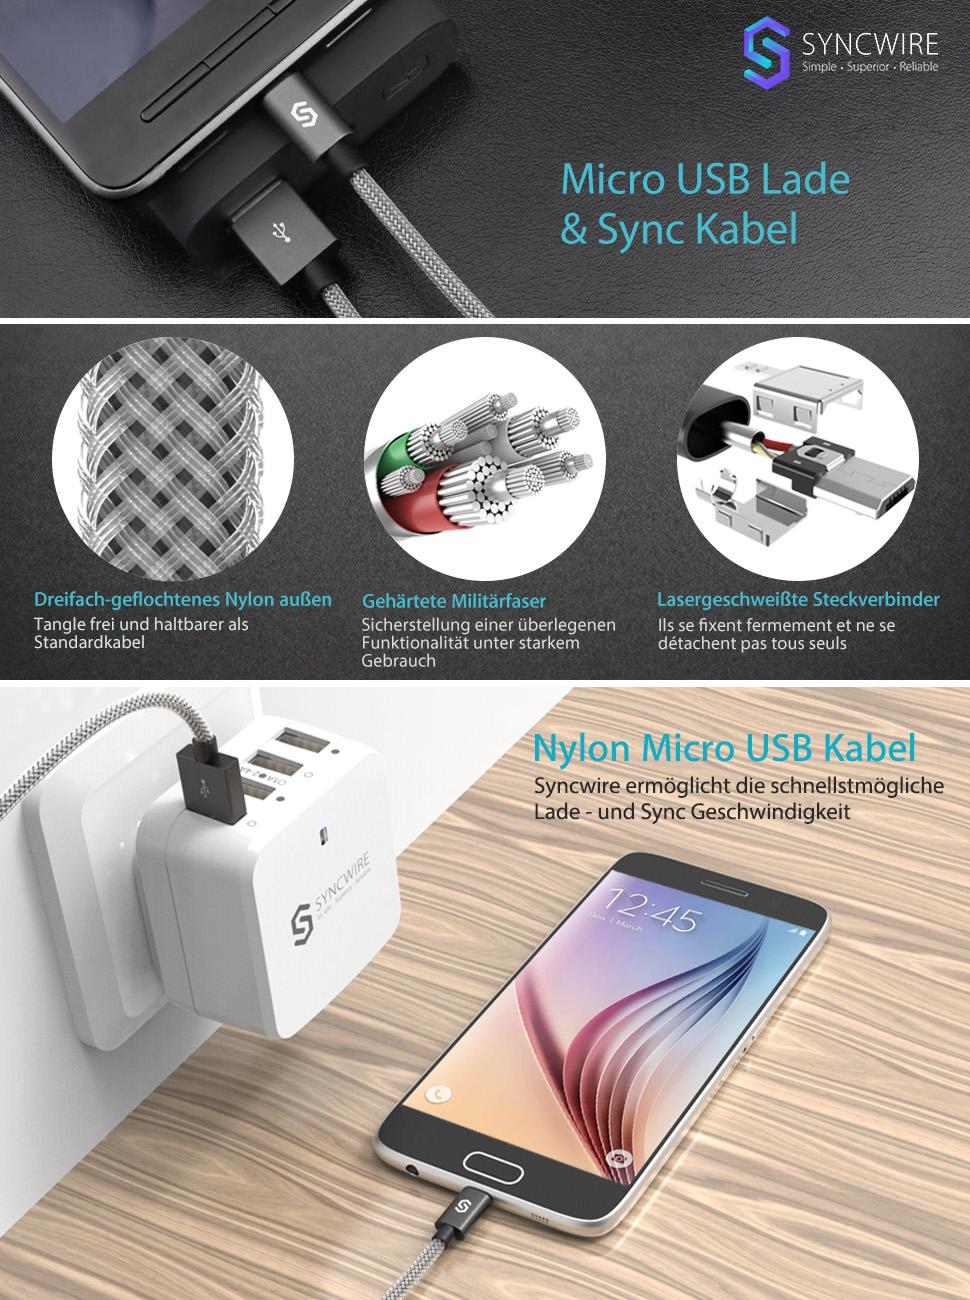 Micro USB Kabel Syncwire 2.4A USB Ladekabel: Amazon.de: Elektronik